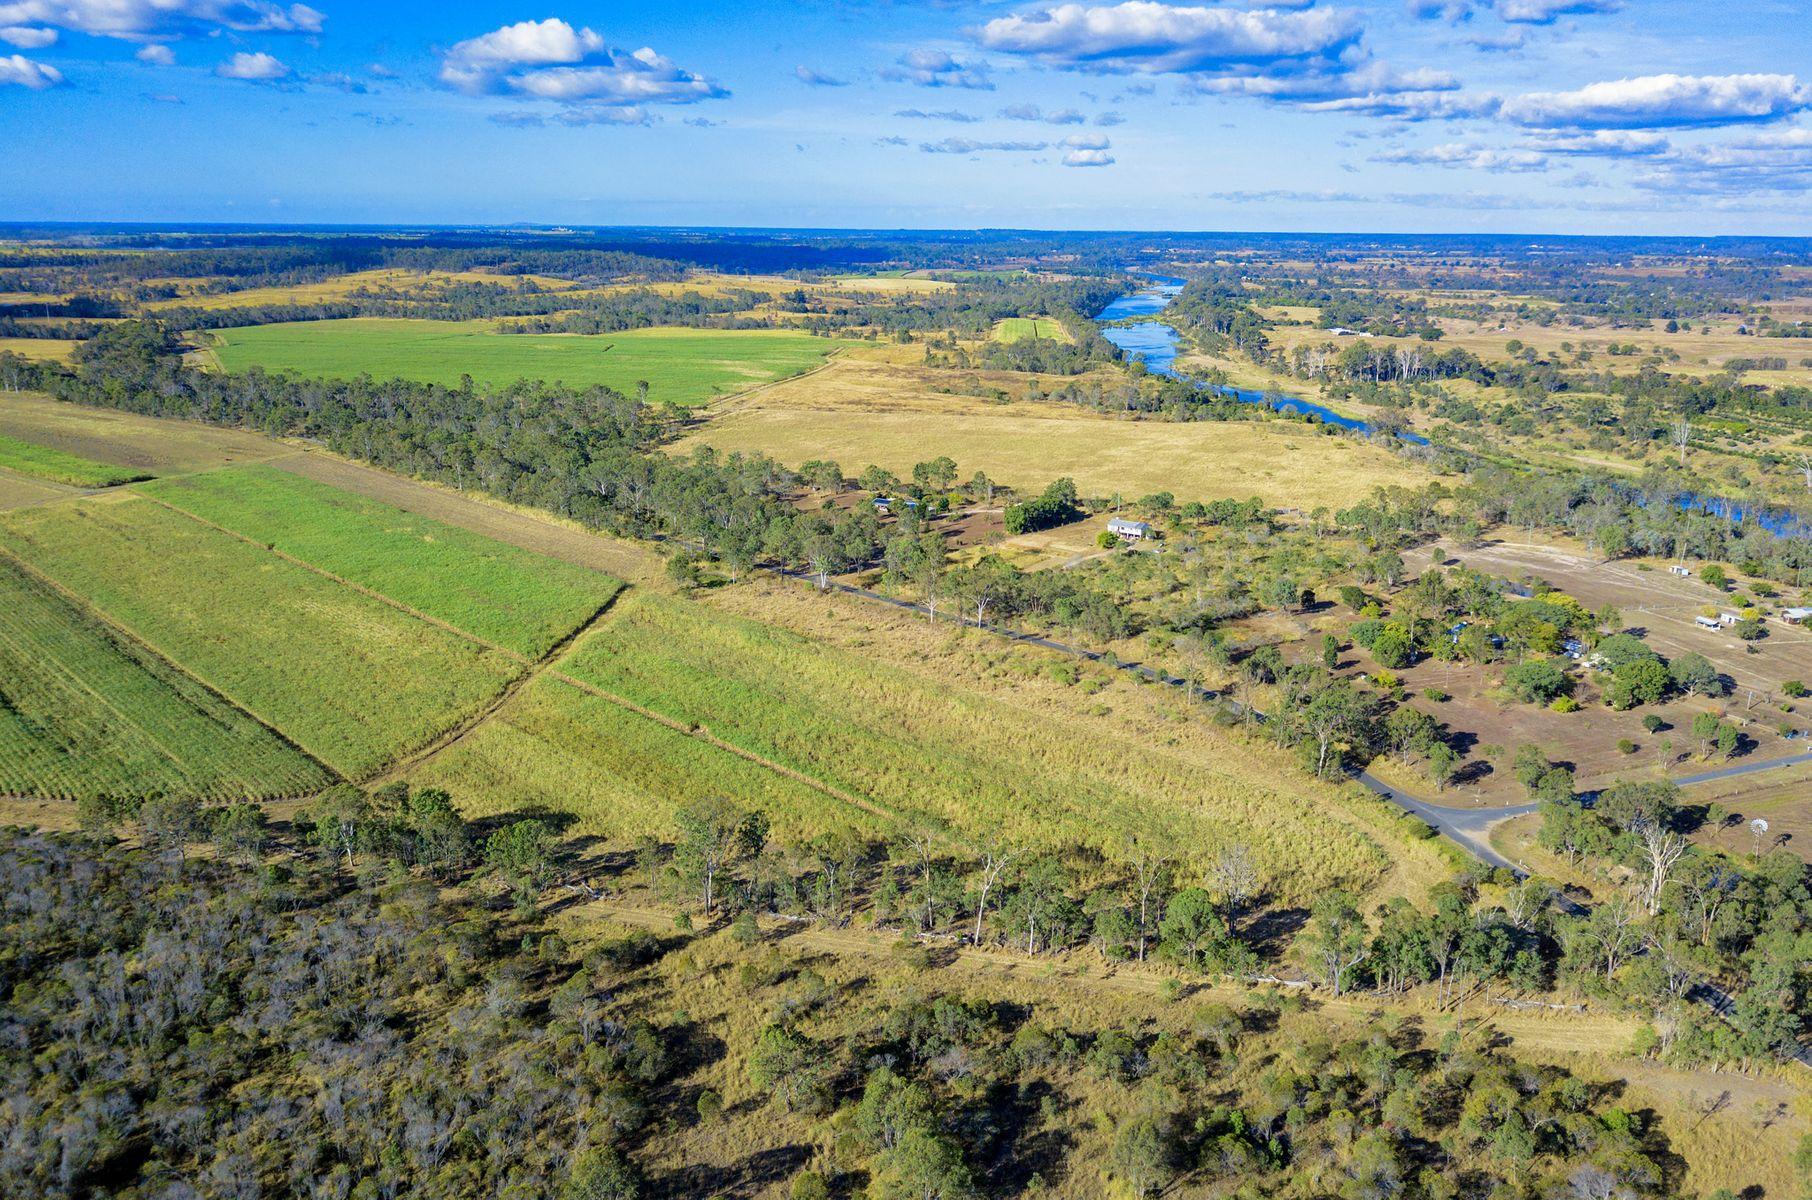 Lot 152/216 Snake Creek Road, Bungadoo, QLD 4671